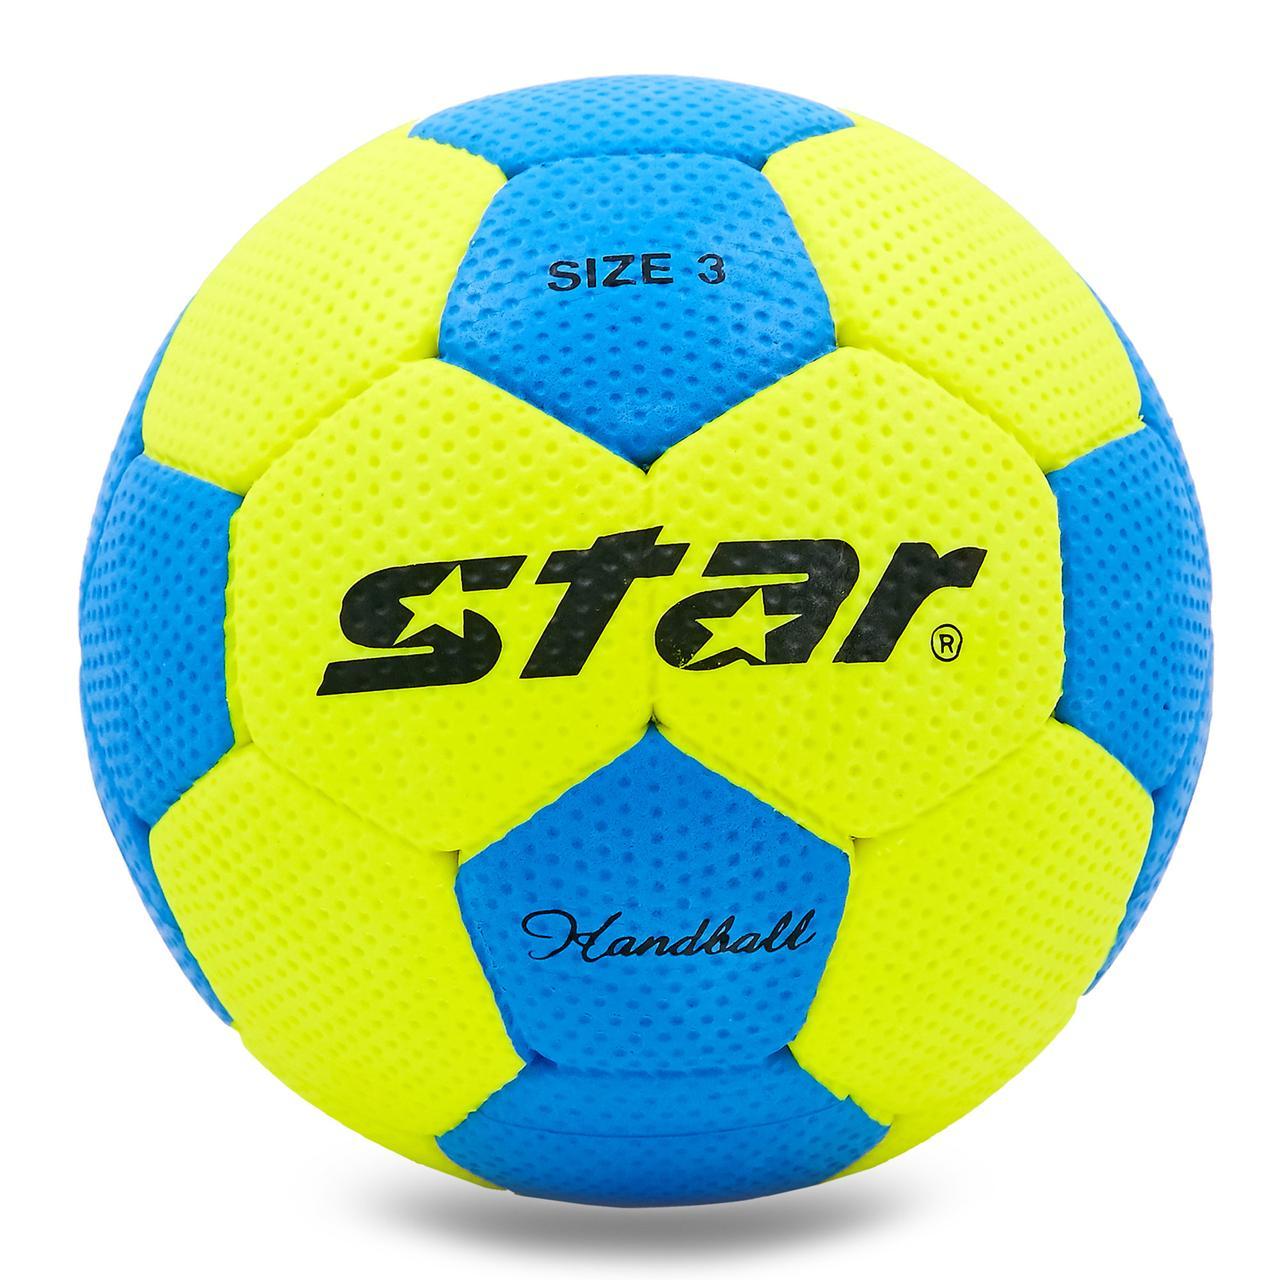 М'яч гандбольний Outdoor покриття спінена гума STAR №3 JMC03002